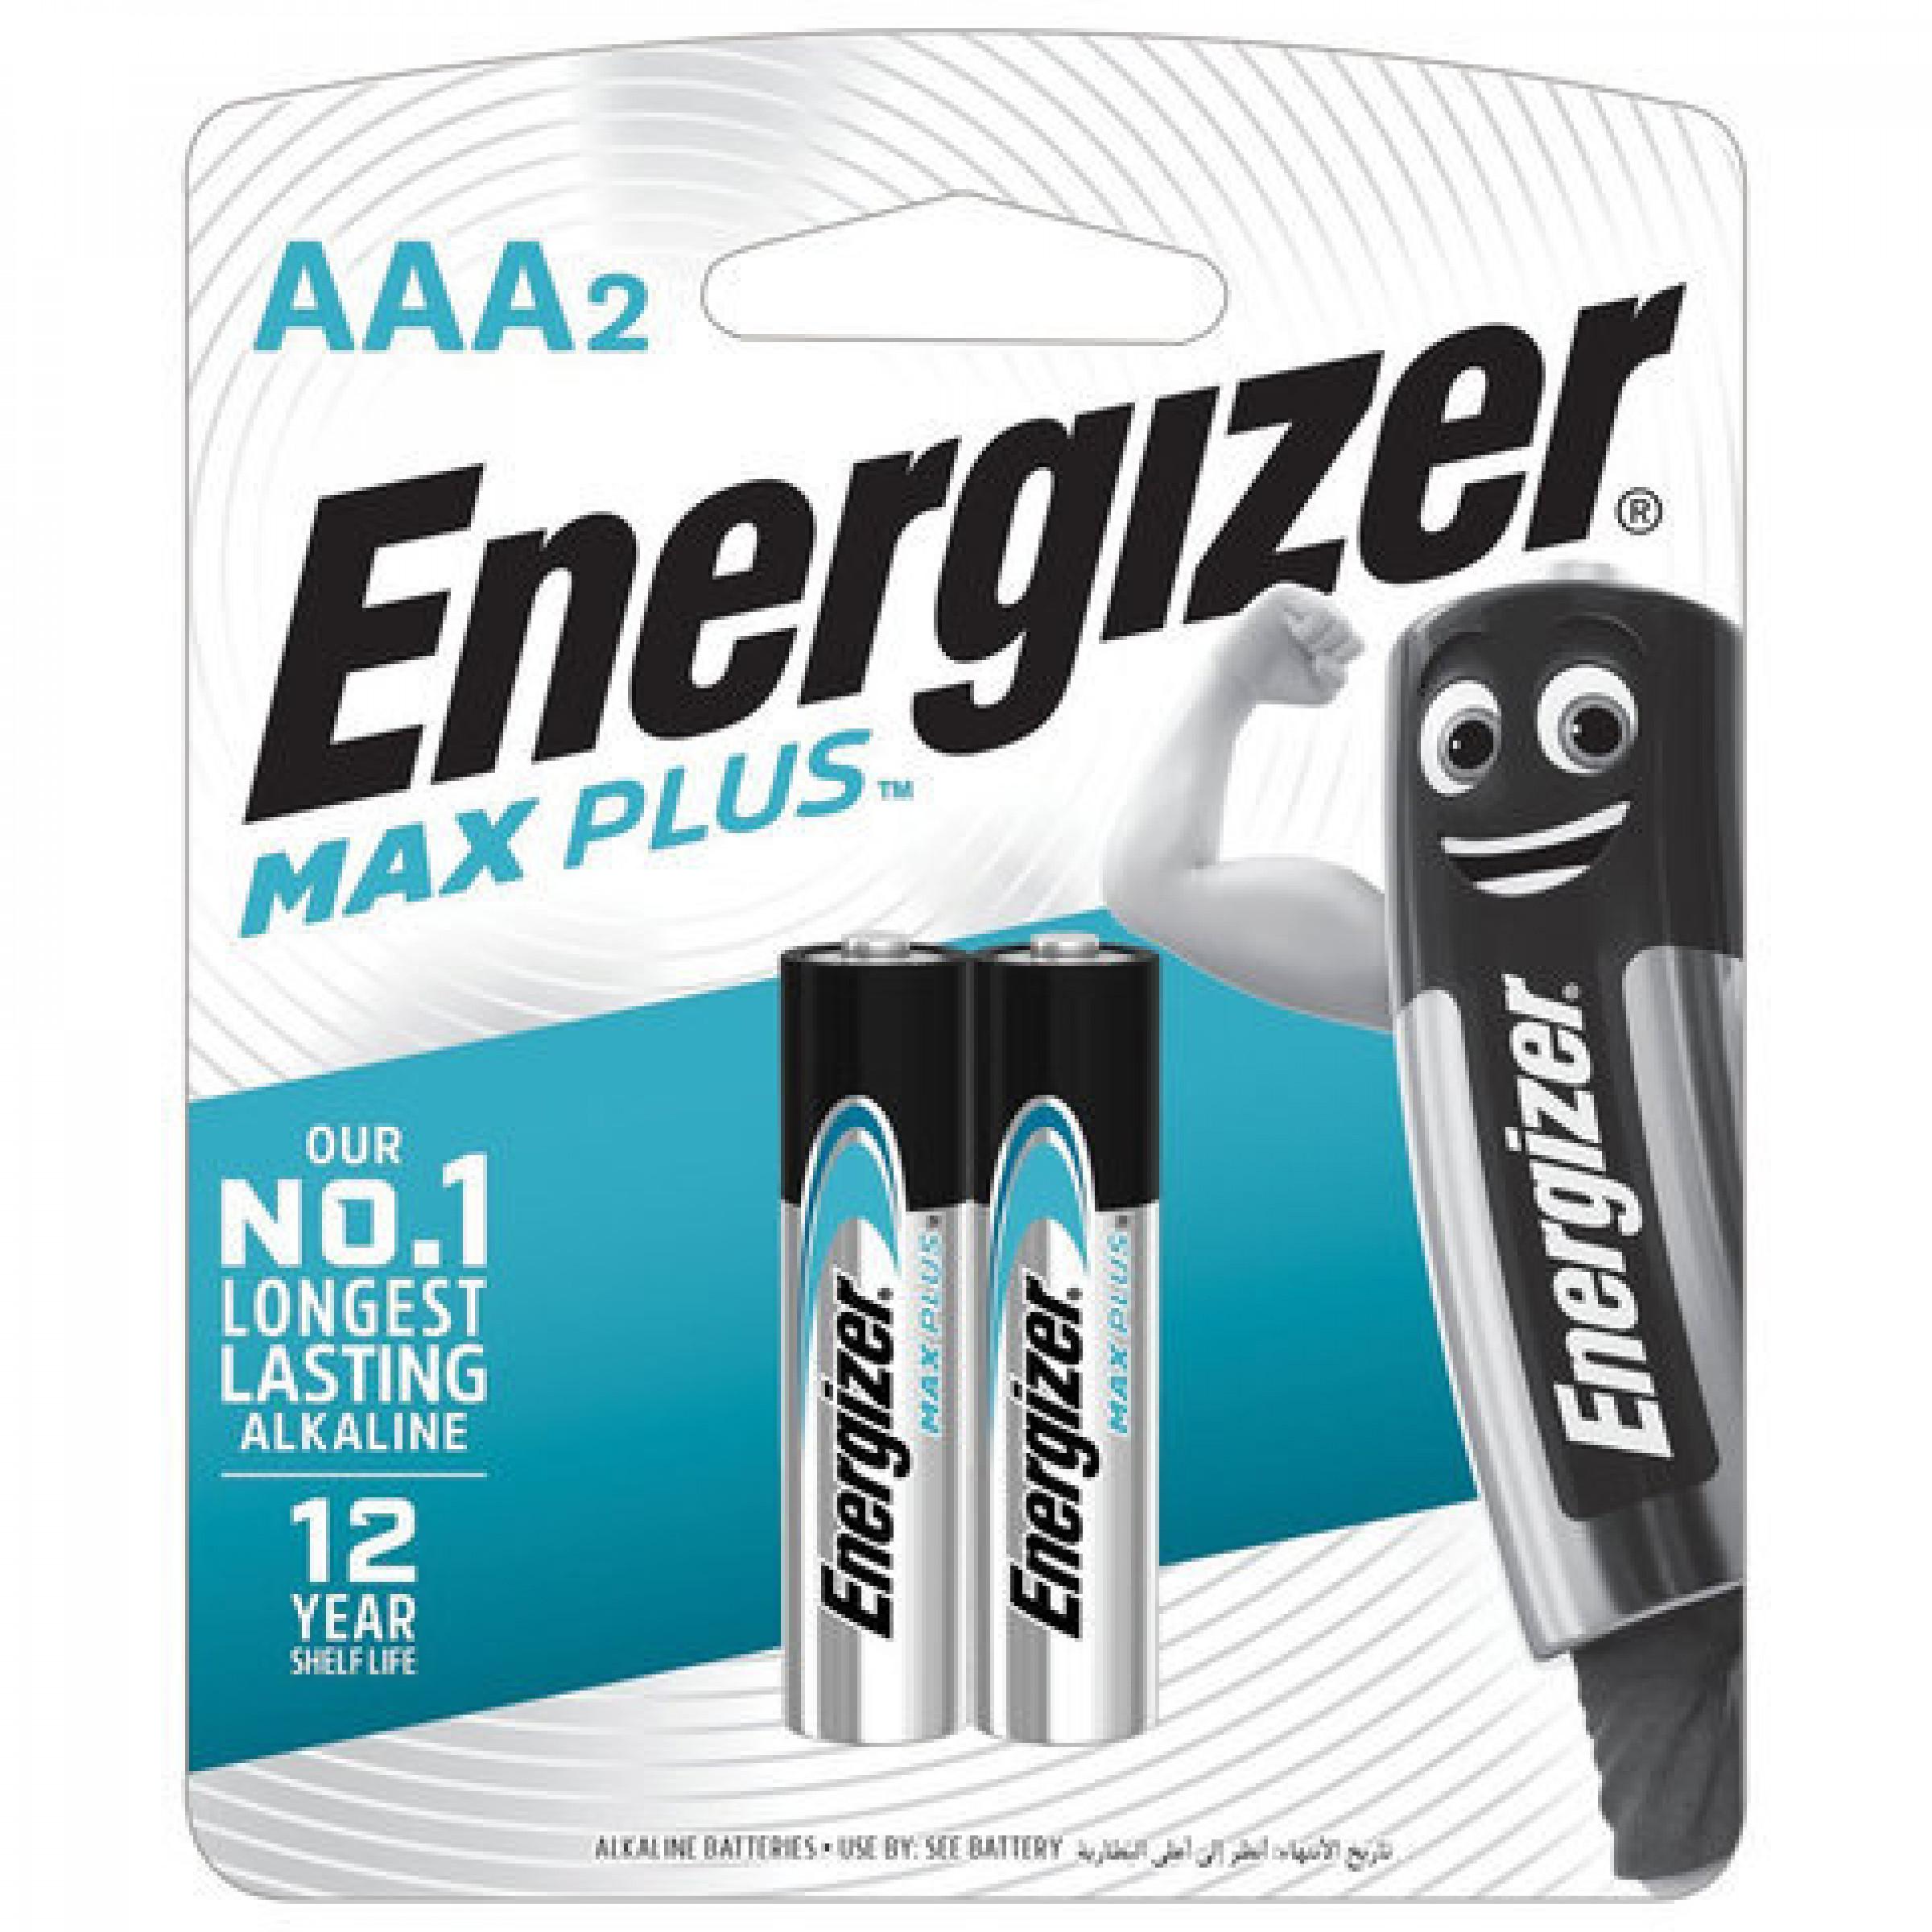 "Батарейки Max Plus AAA/E92 BP2 ""ENERGIZER"", 2шт"